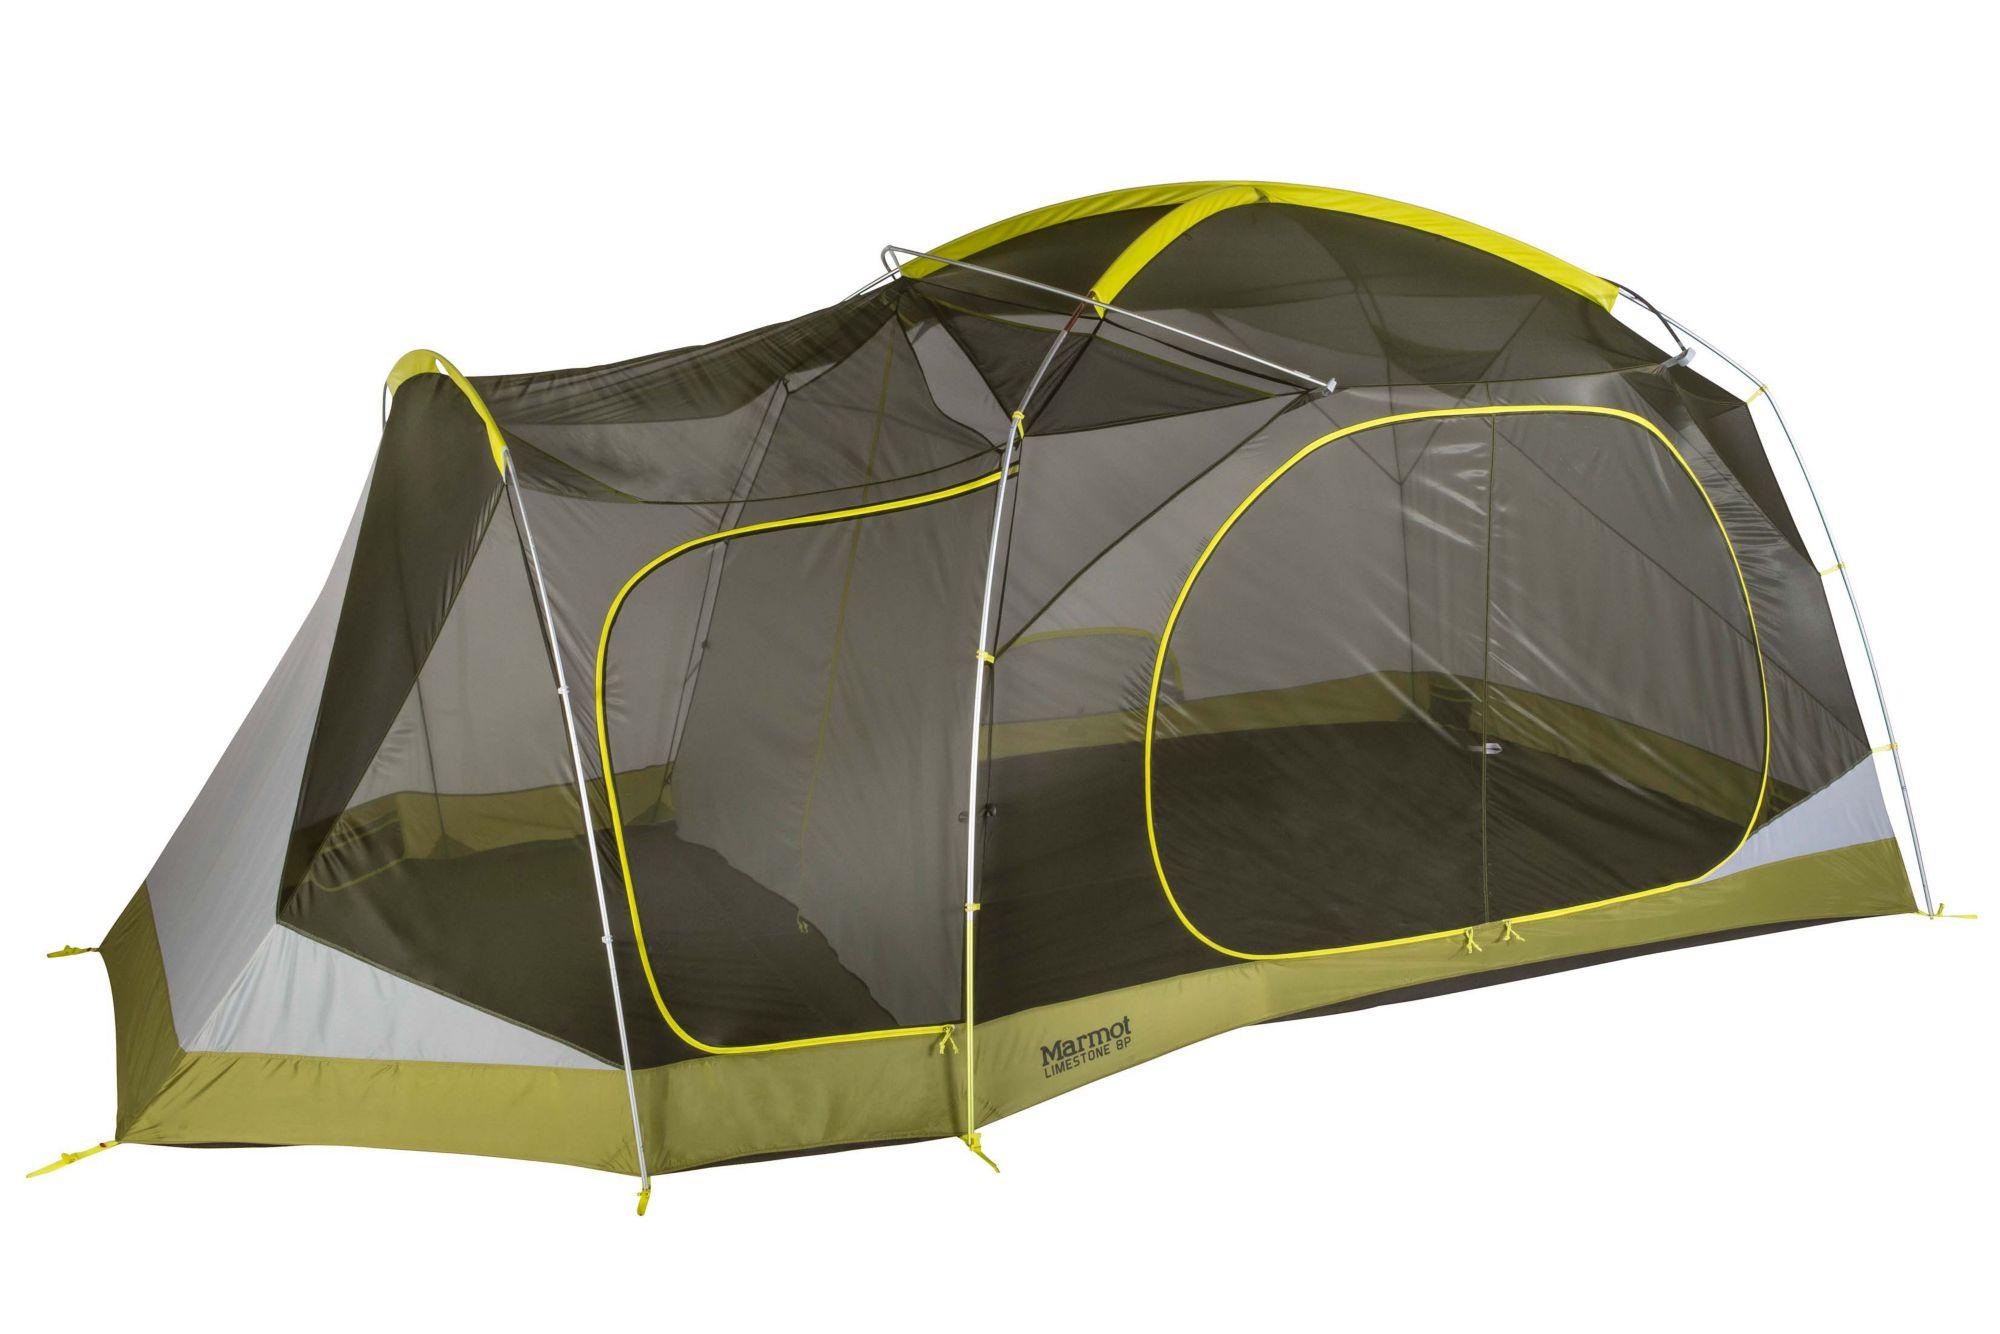 Limestone 8P Green Shadow/Moss medium  sc 1 st  Marmot & 8 Person Tents / Tents / Equipment   Marmot.com